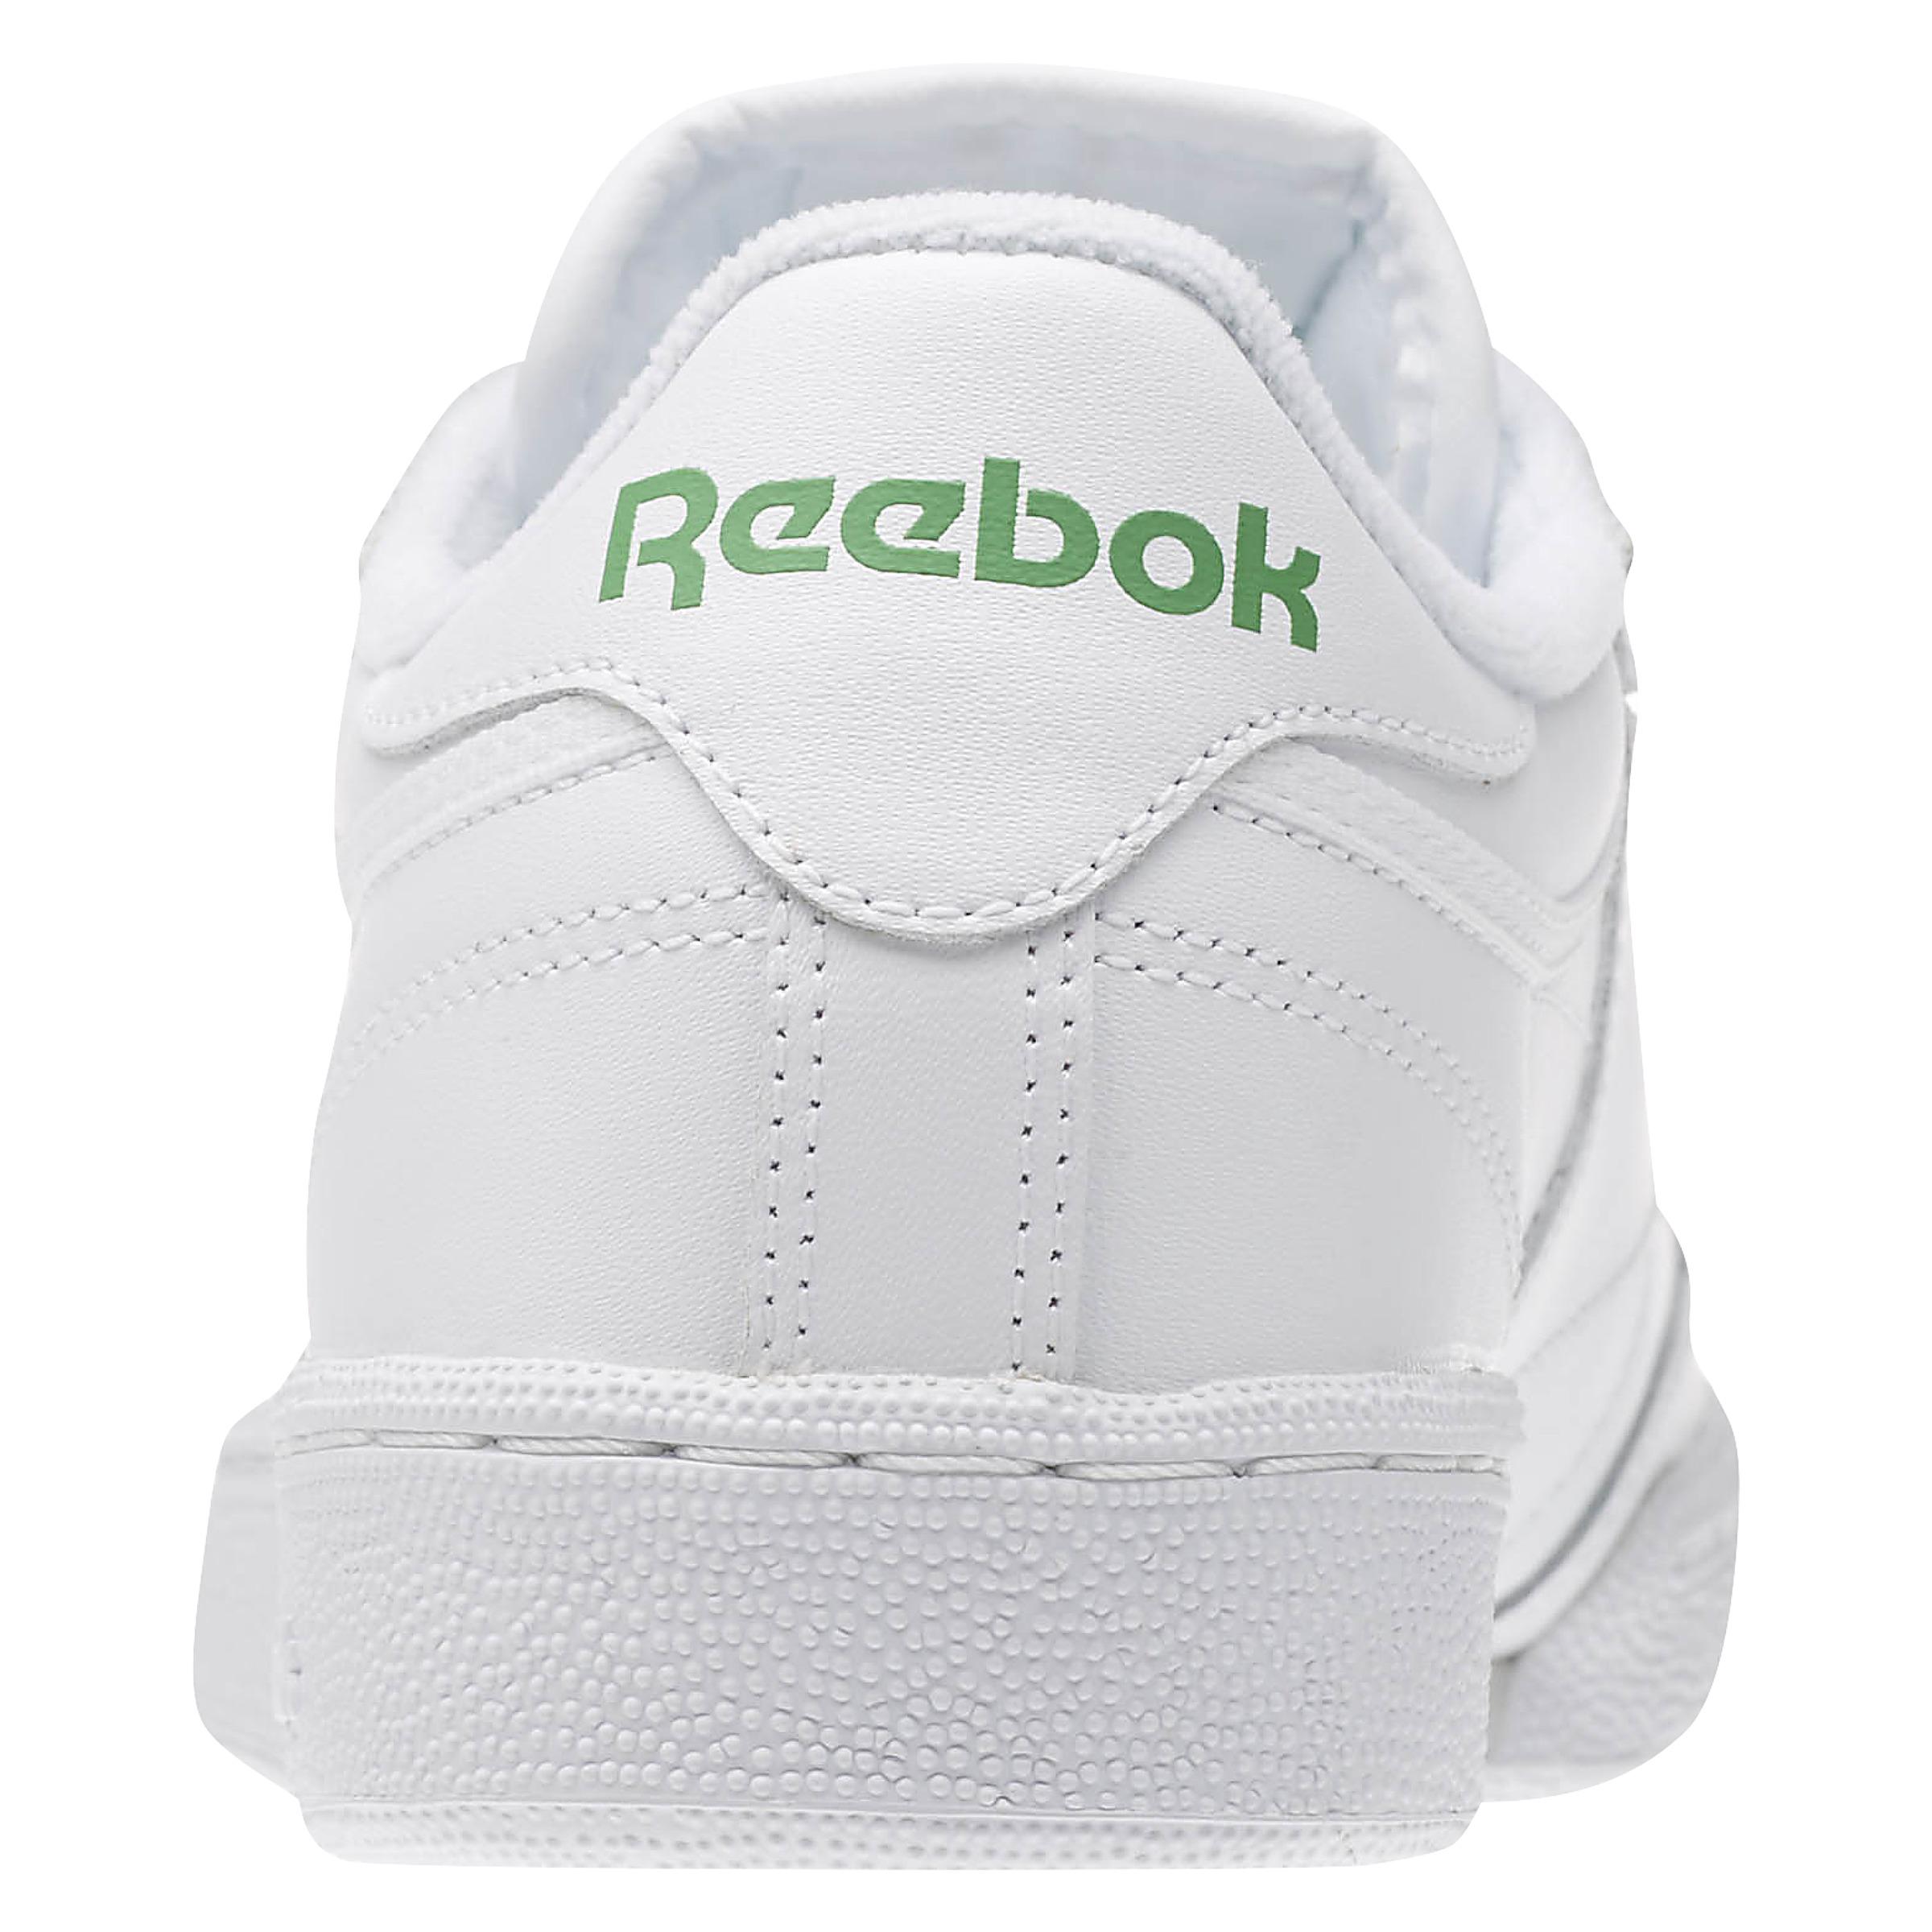 47fd630c10547 Reebok MEN Classic CLUB C 85 AR0456- 3 - Reebok